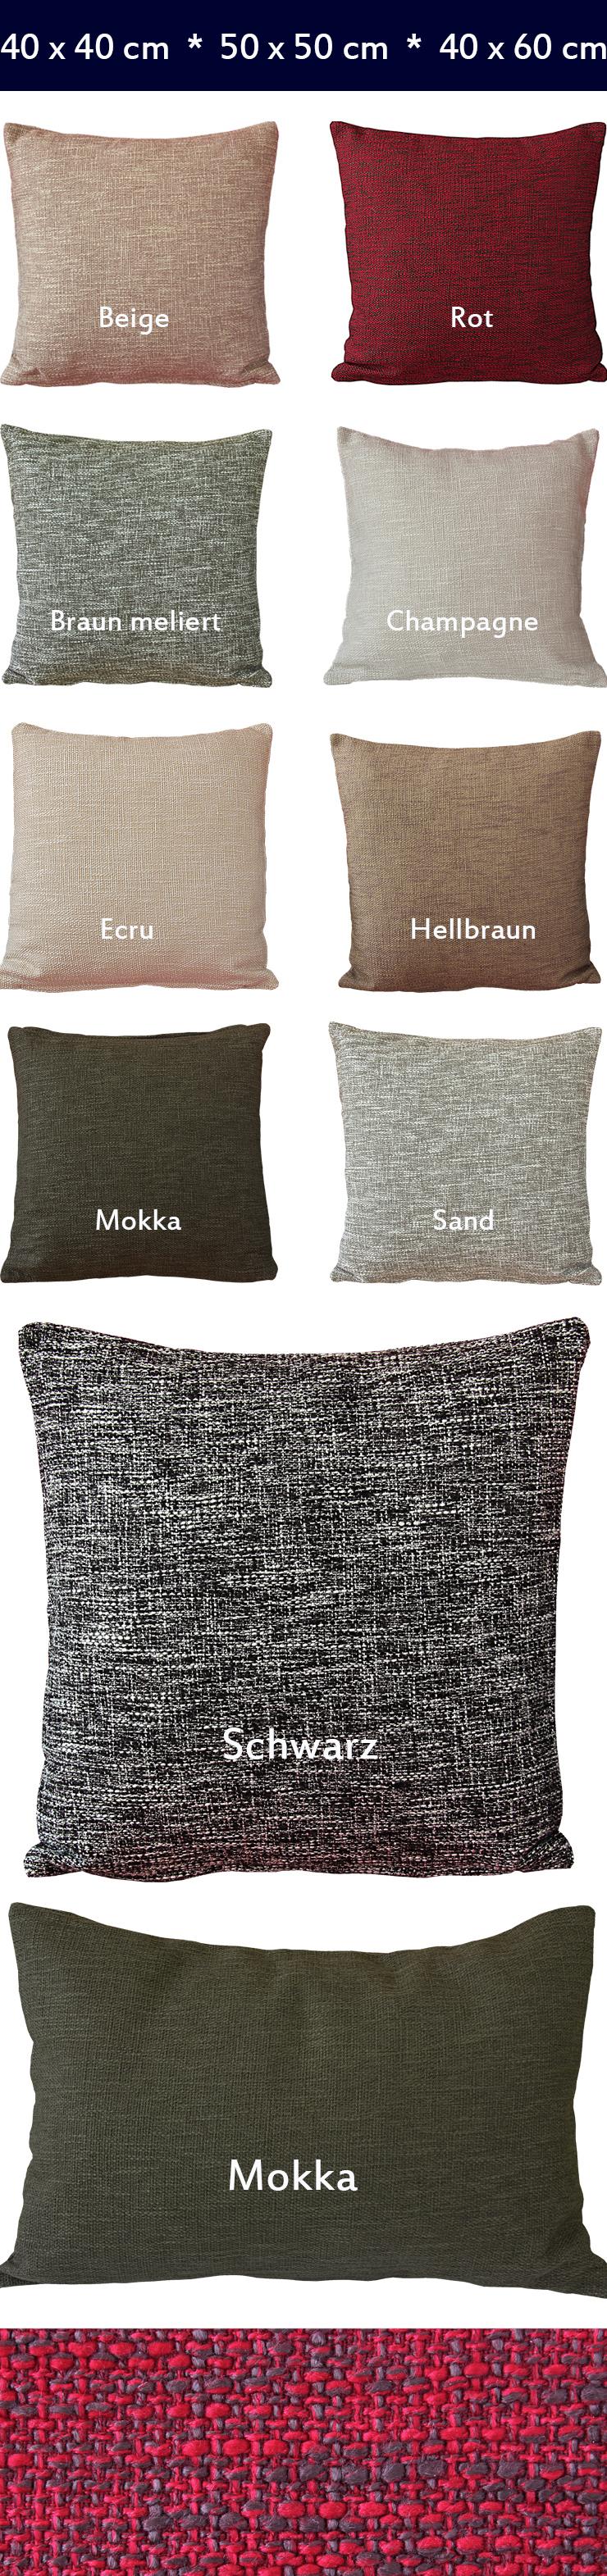 hochwertige kissenh lle leinenoptik 40x40 50x50 40x60 cm. Black Bedroom Furniture Sets. Home Design Ideas